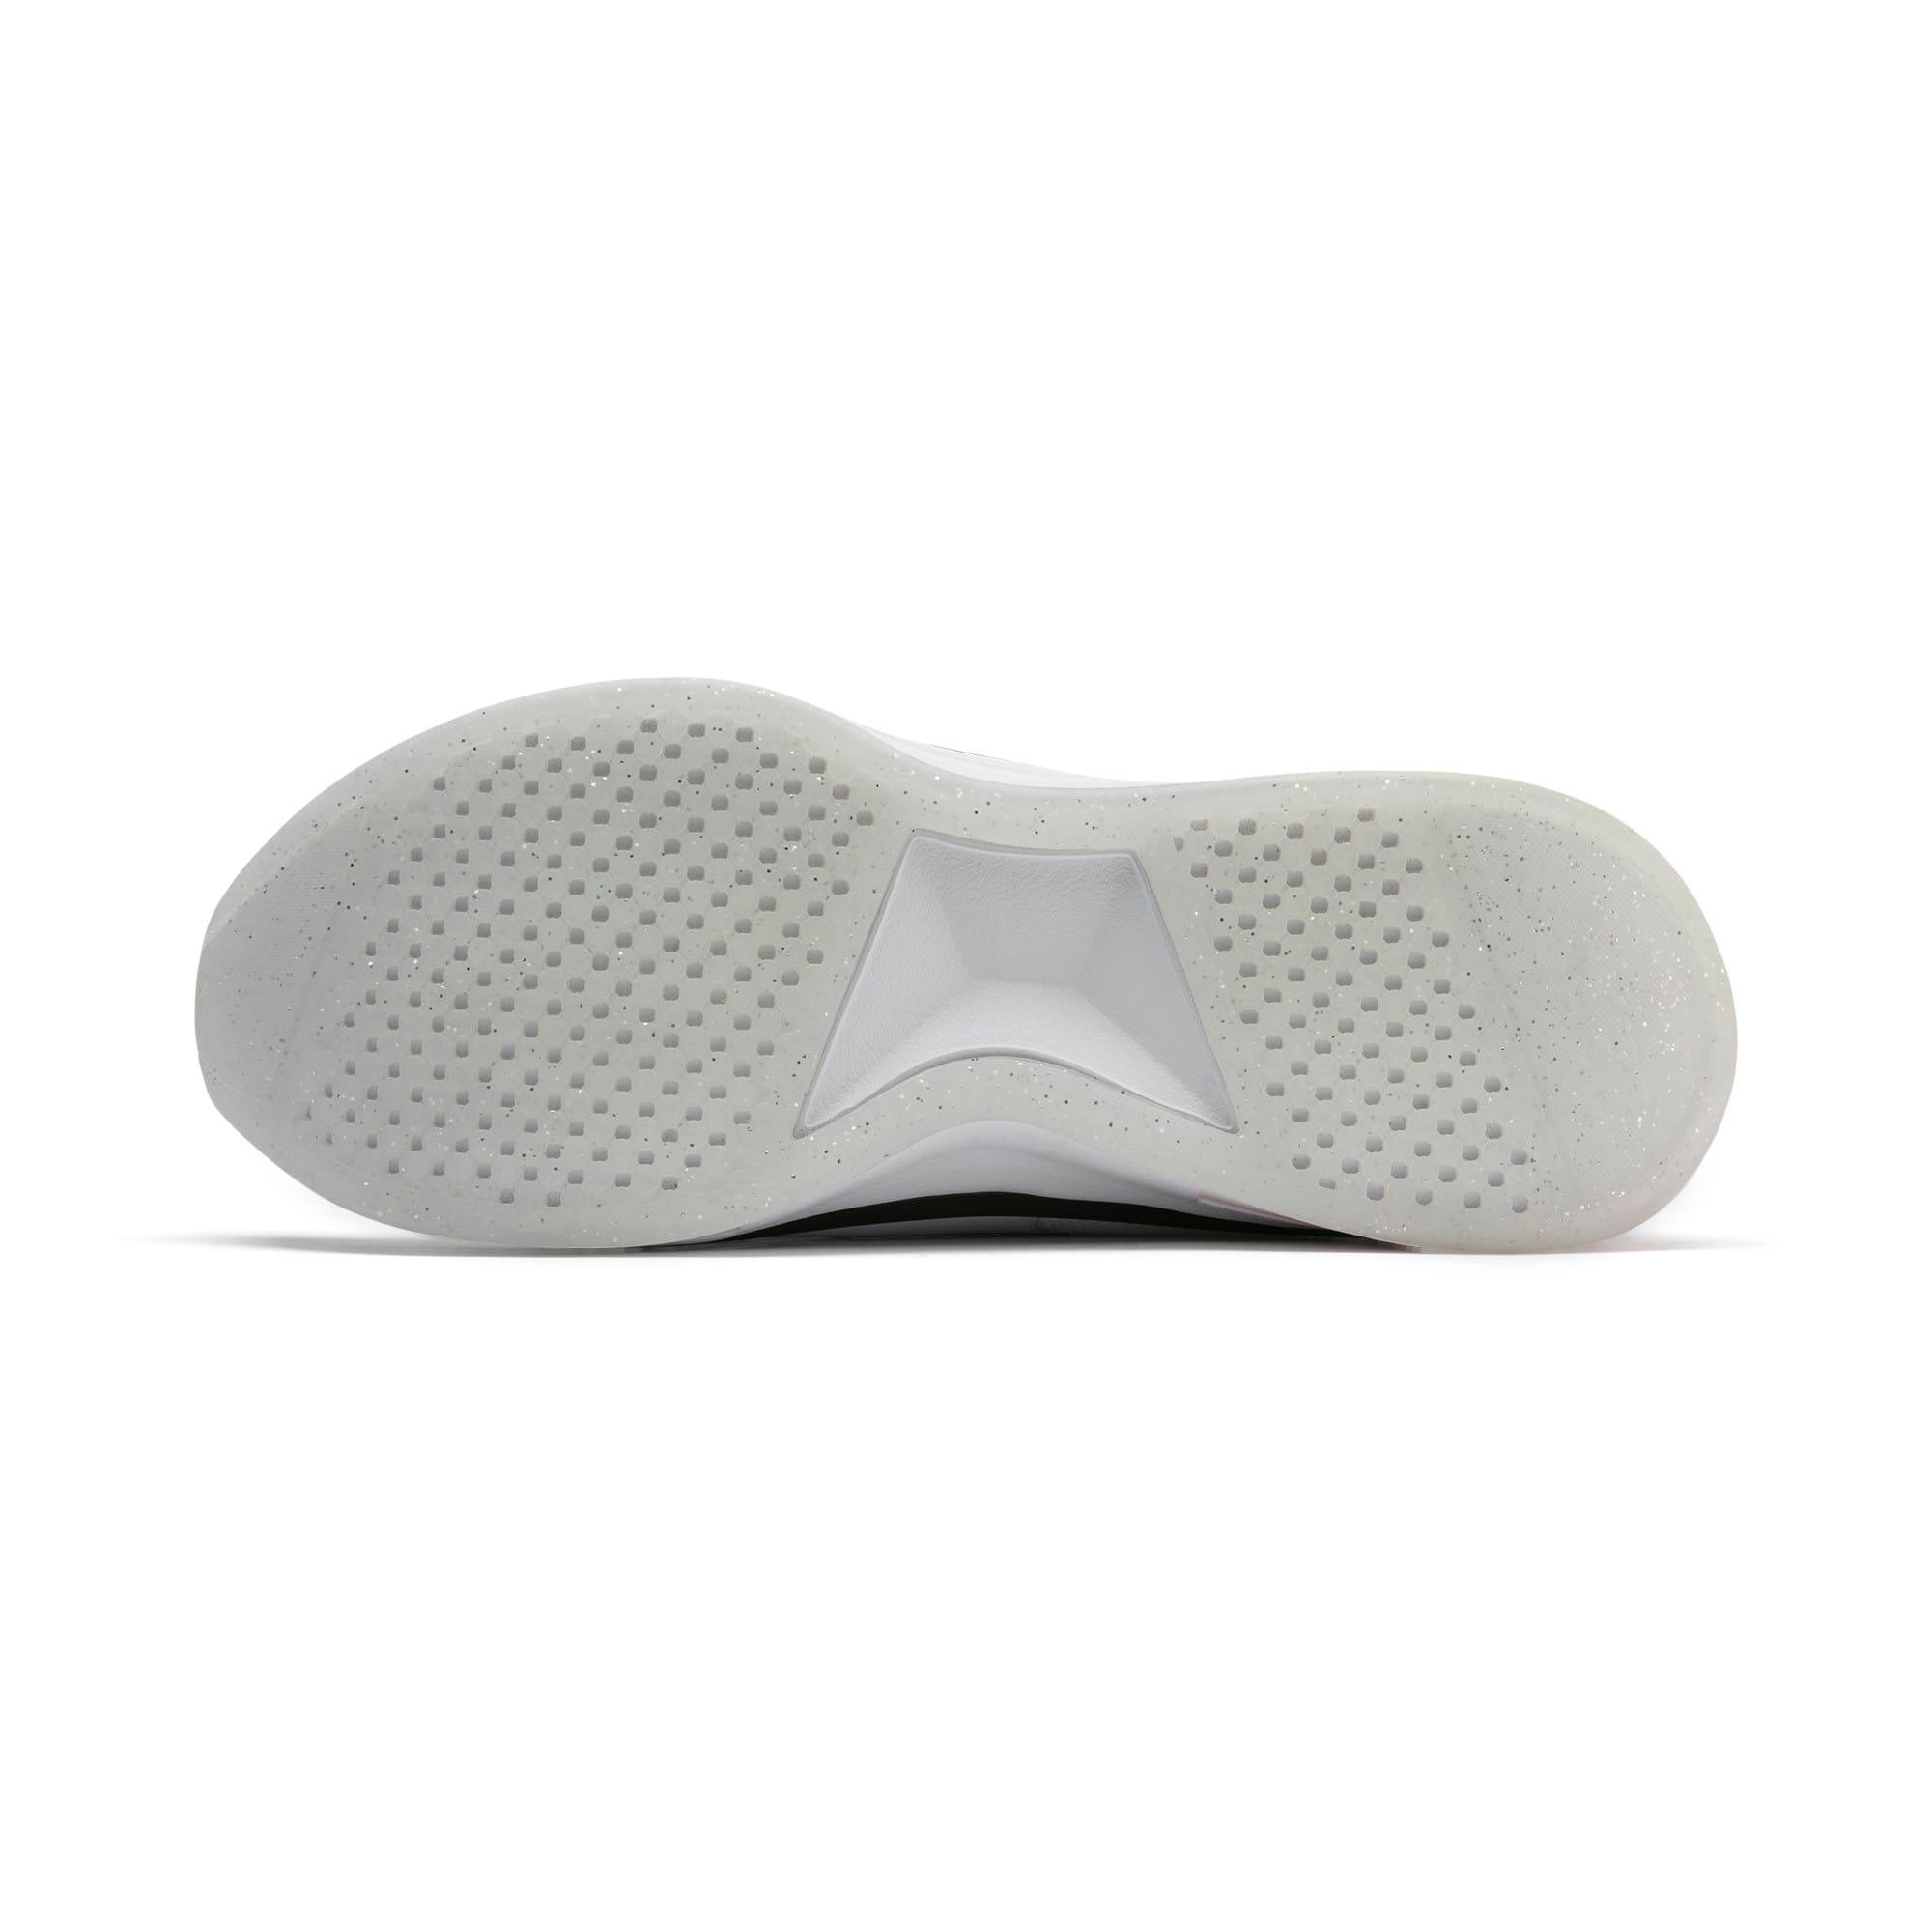 Thumbnail 5 of PUMA x SELENA GOMEZ Slip-On Women's Training Shoes, Puma White-Puma Black, medium